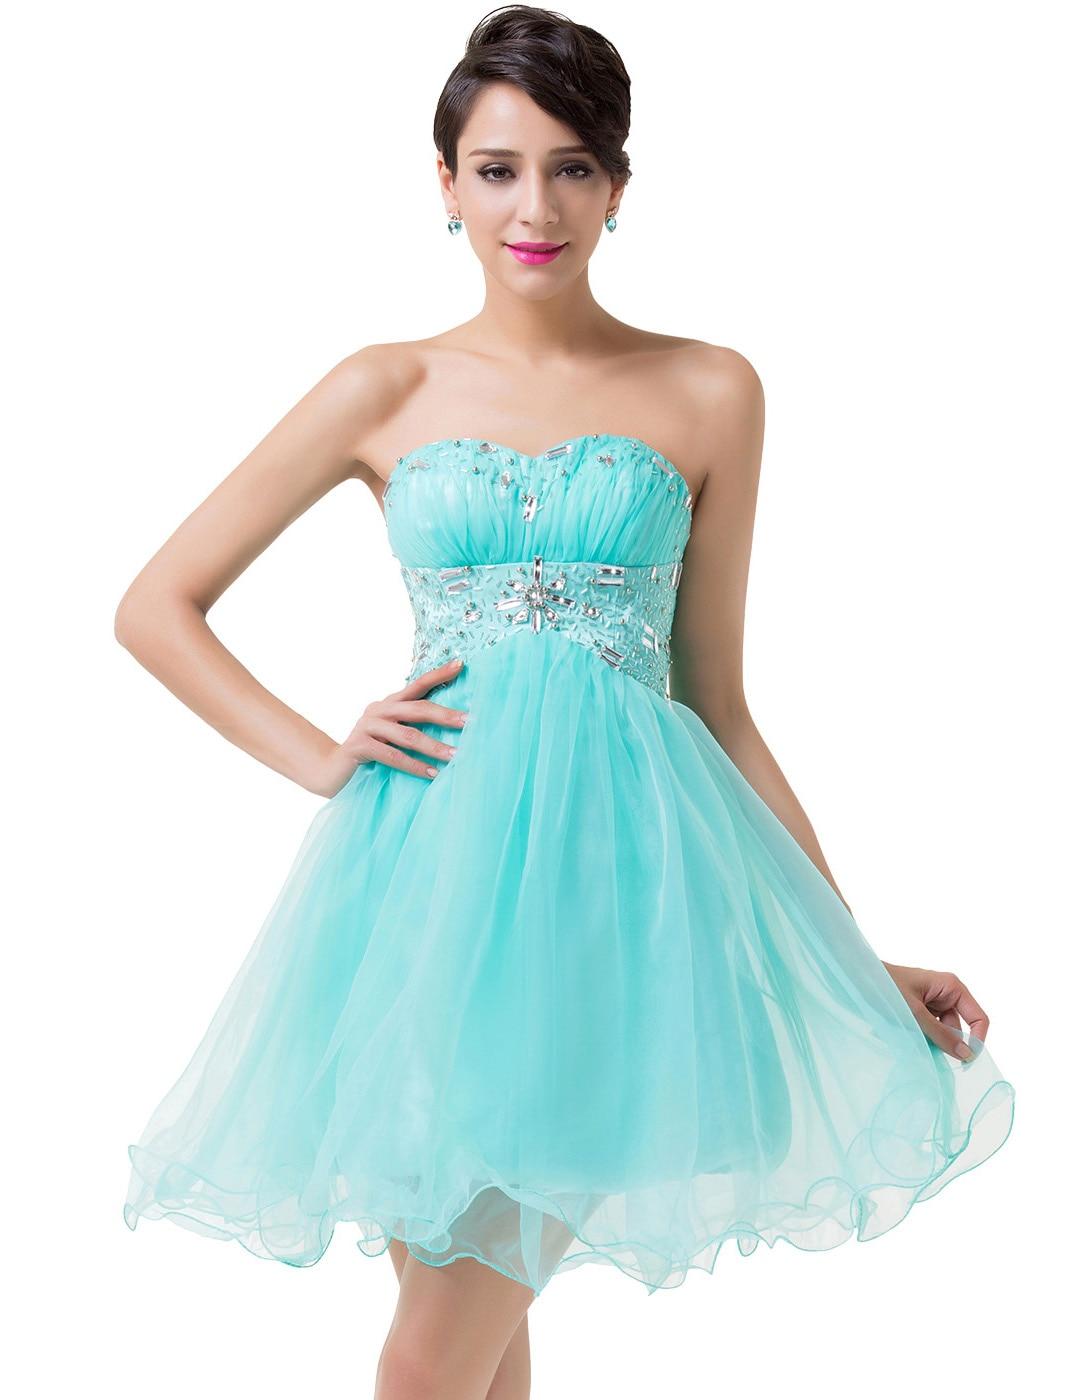 Enchanting Prom Dresses Corpus Christi Gallery - All Wedding Dresses ...